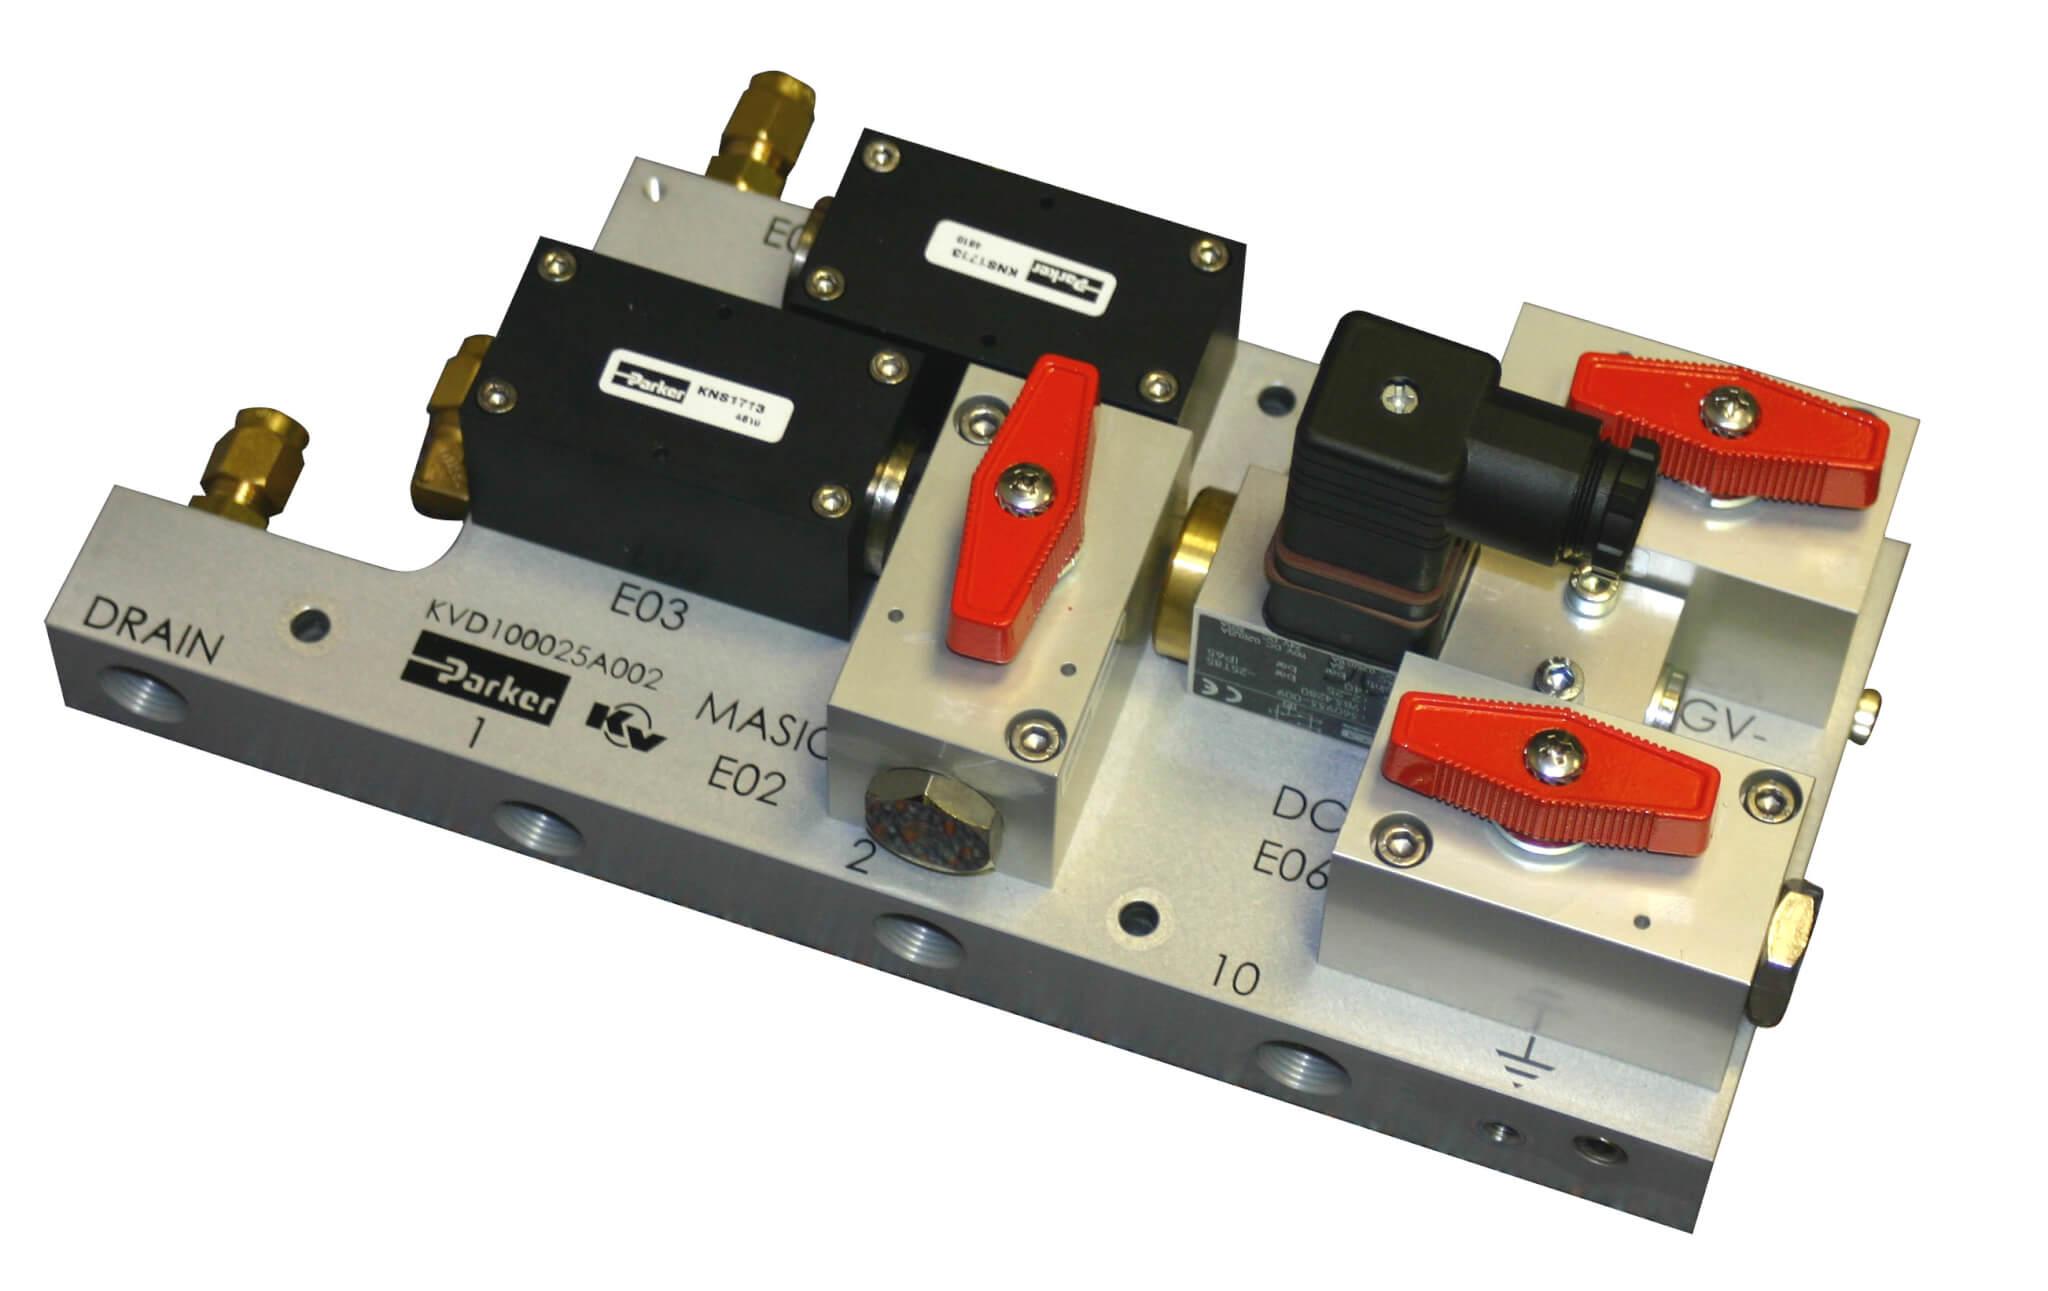 Modular Control System including valve for pantograph controls